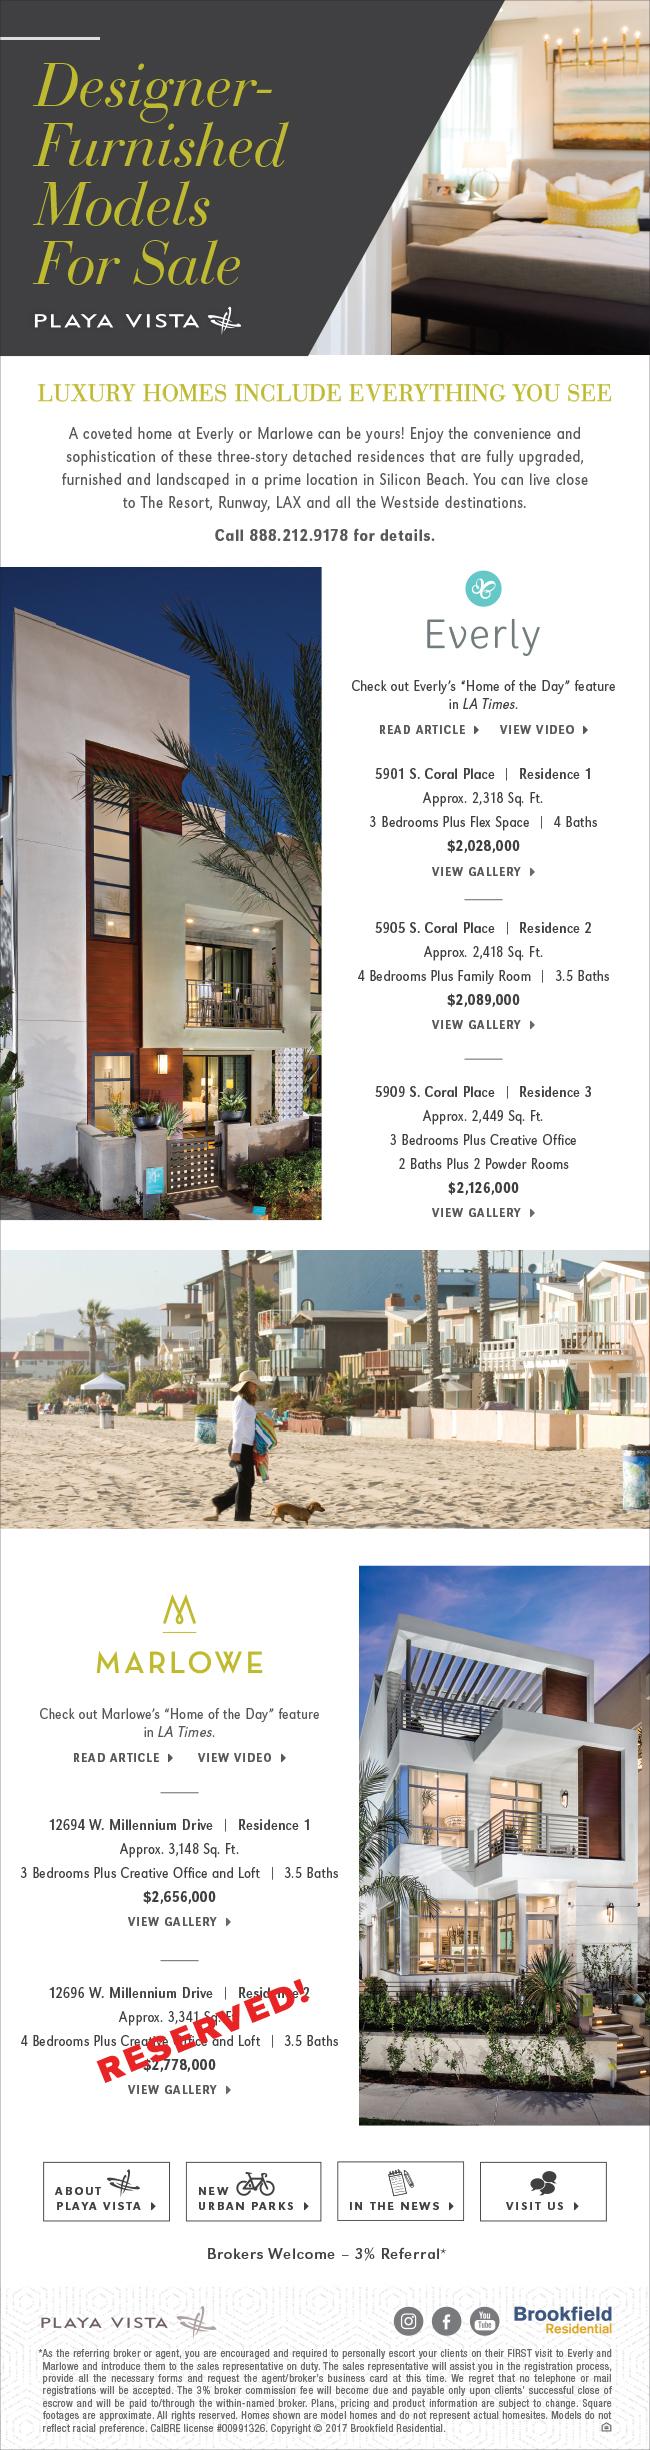 Playa Vista Houses For Sale